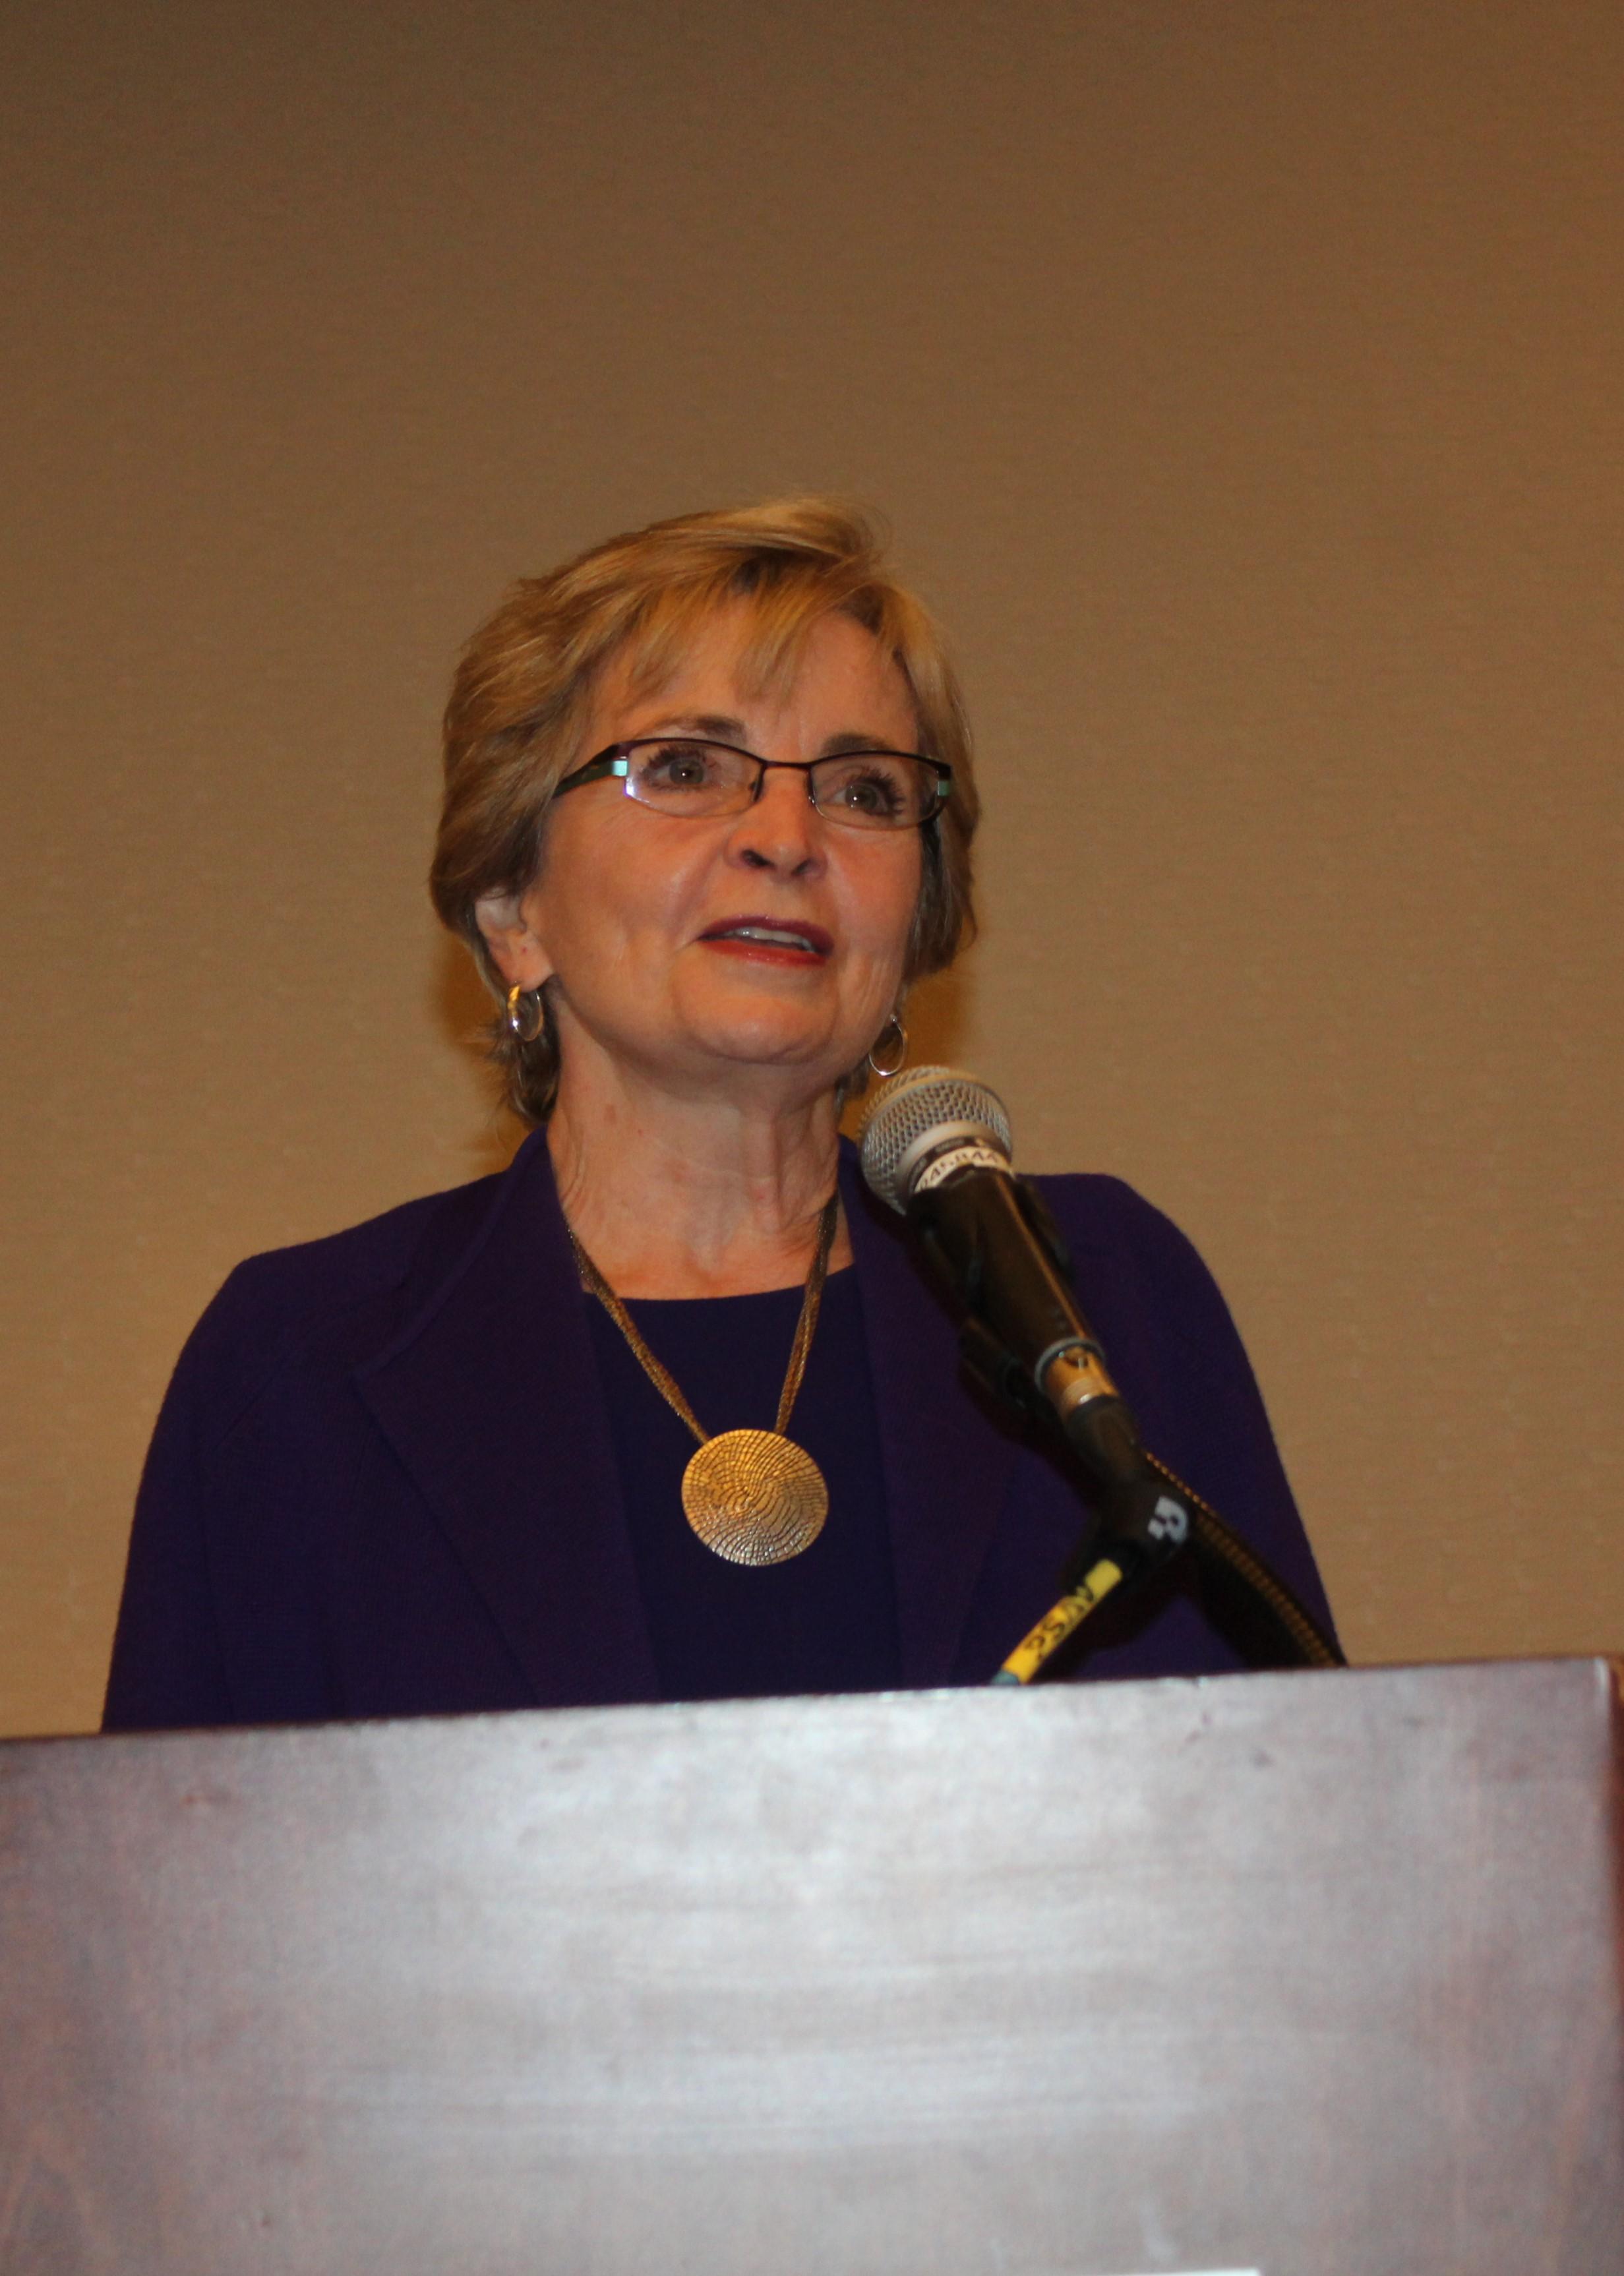 Former Superintendent of Public Instruction June Atkinson